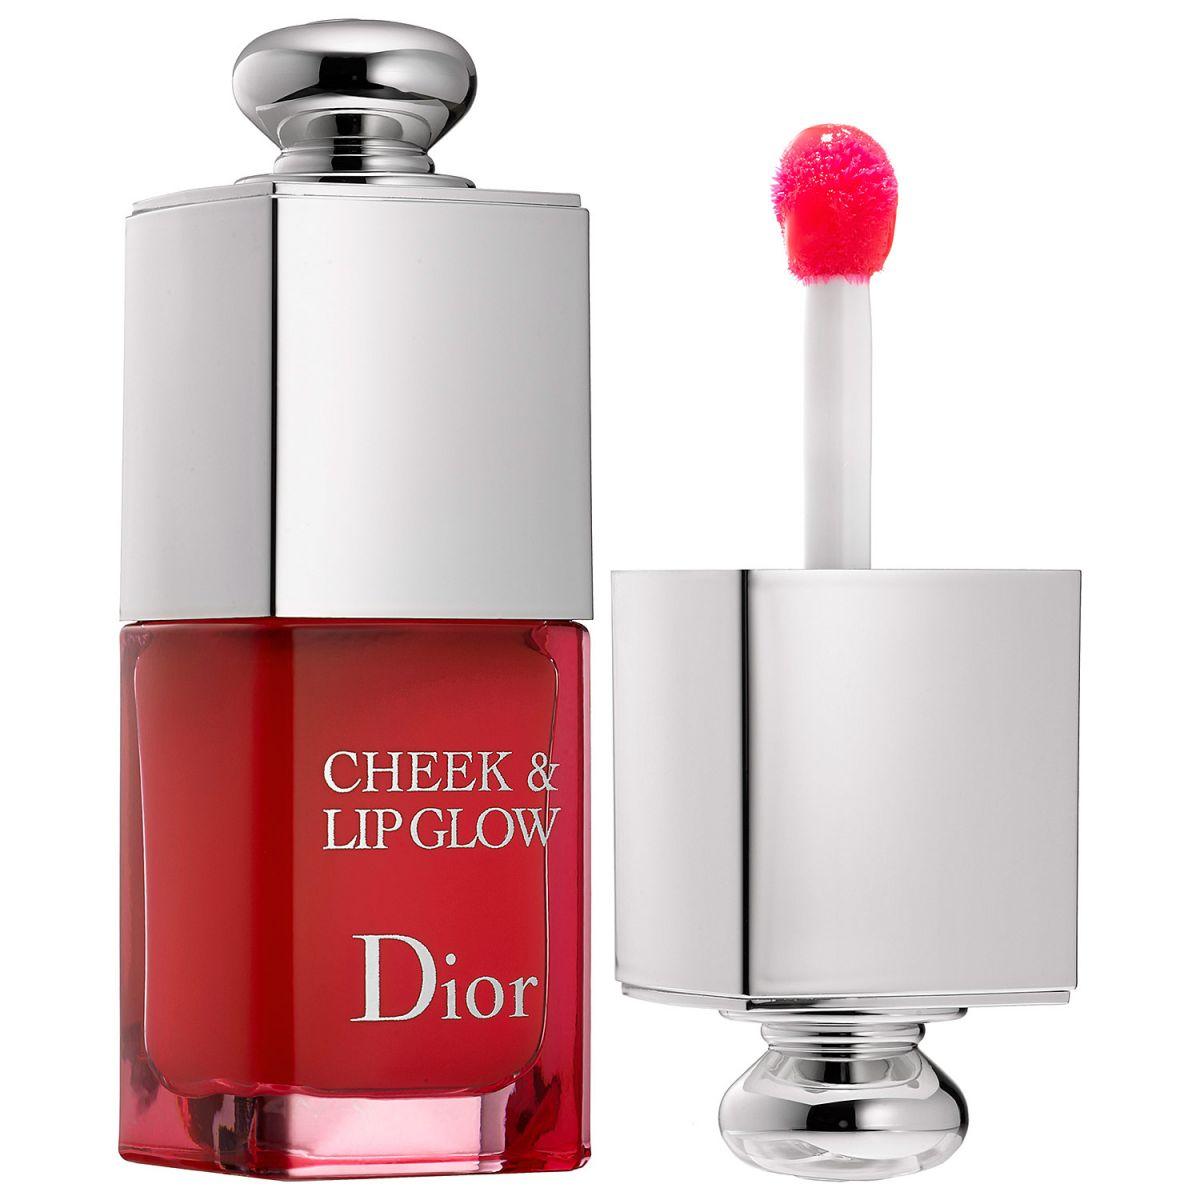 Cheek & Lip Glow